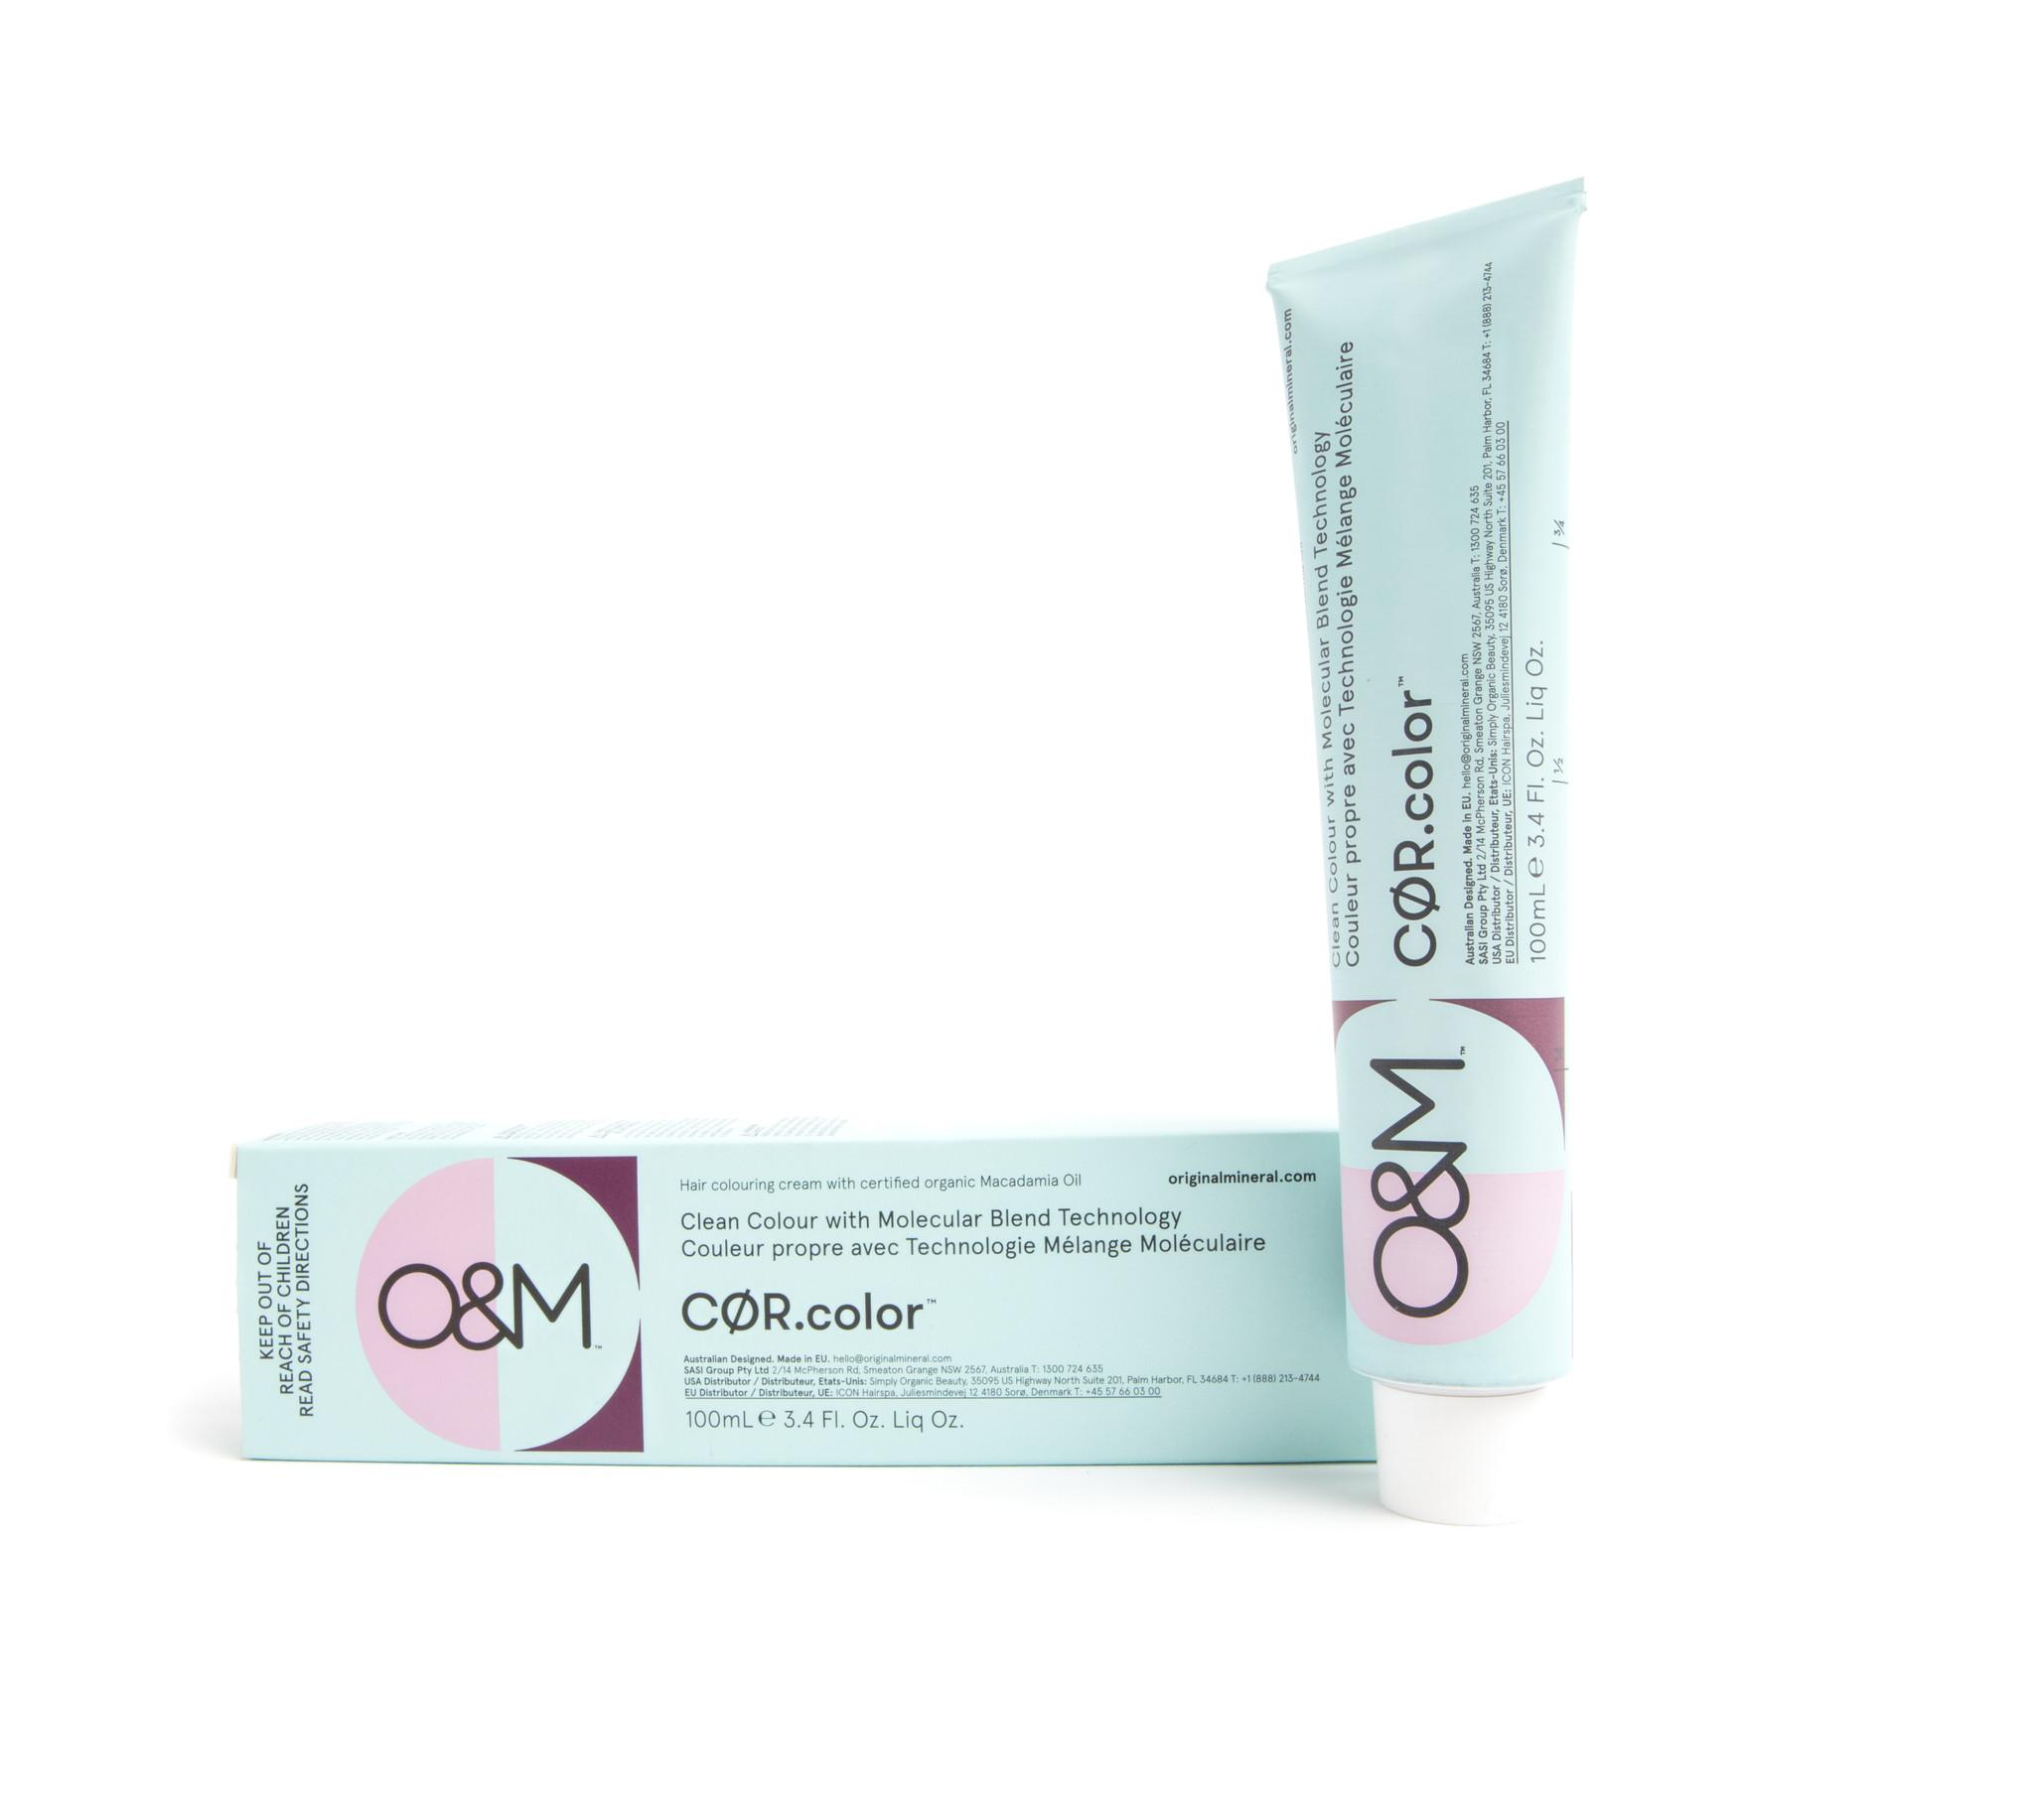 O&M - Original Mineral O&M CØR.color ash - Light Ash Brown 5.1 100g